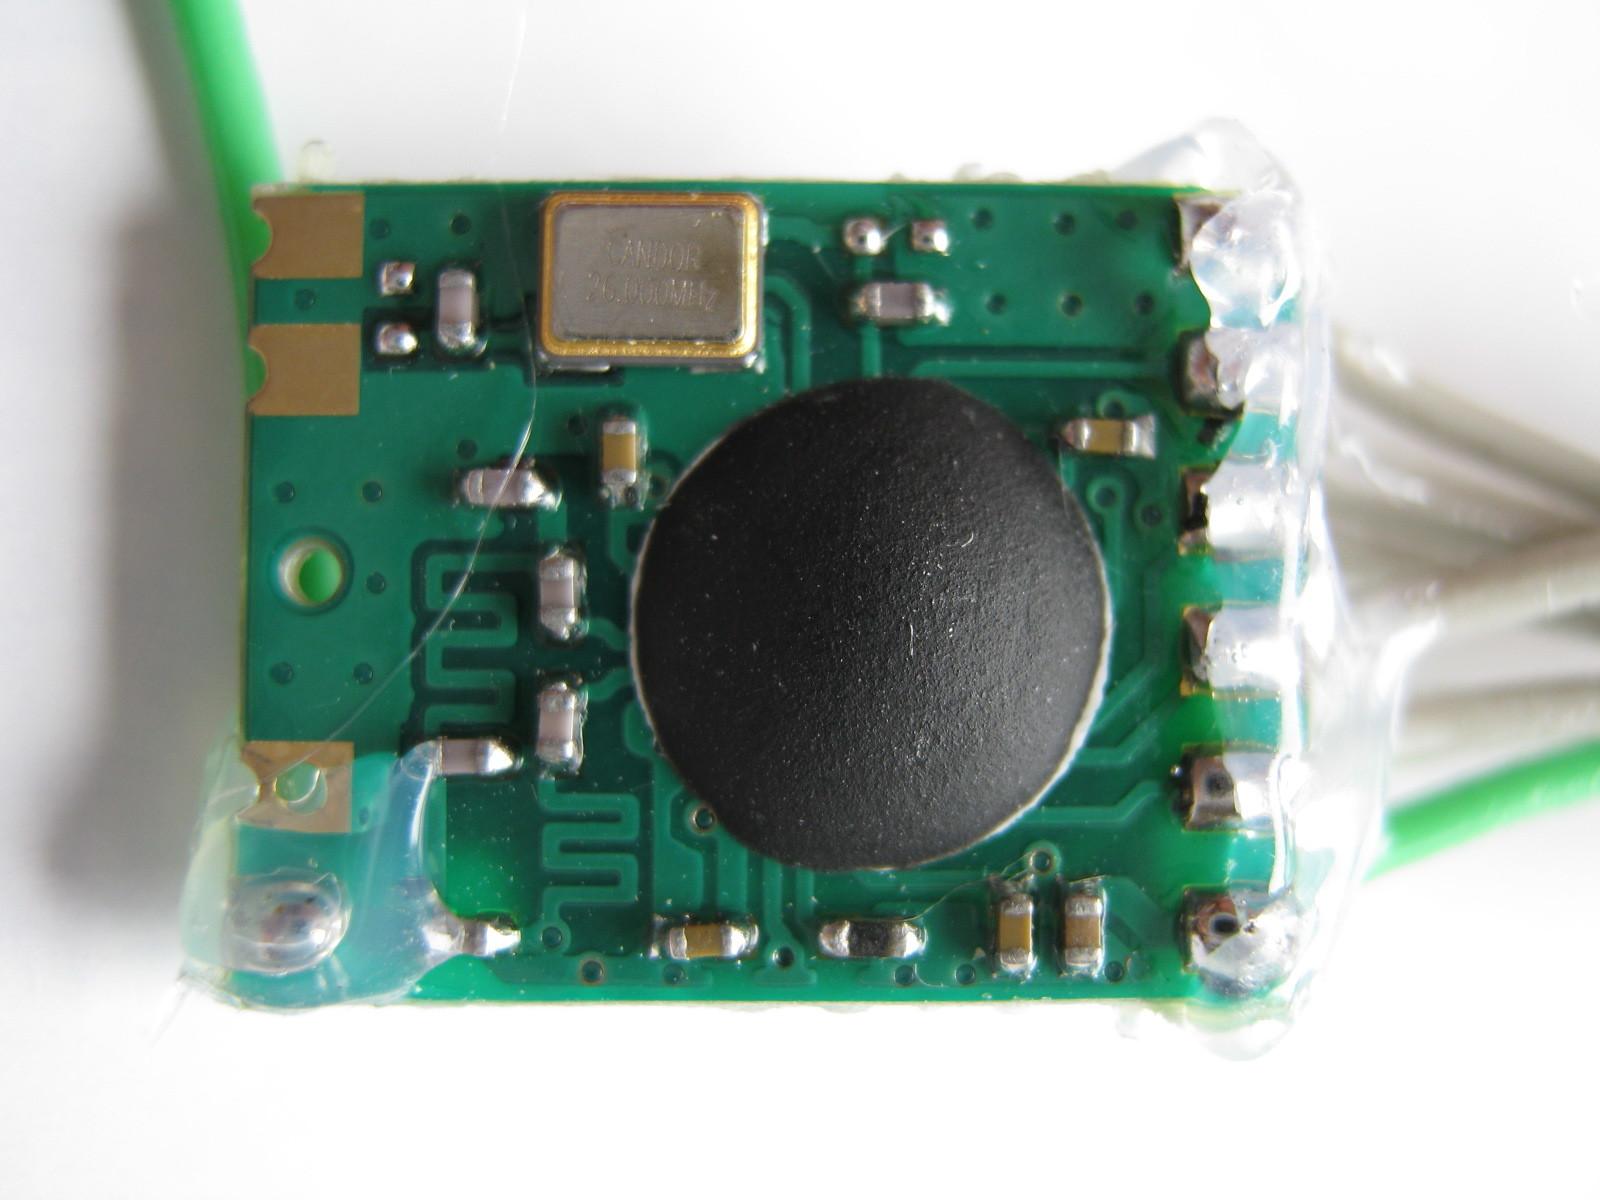 2.4GHzラジコン用ファームウェア製作(CC2500)表